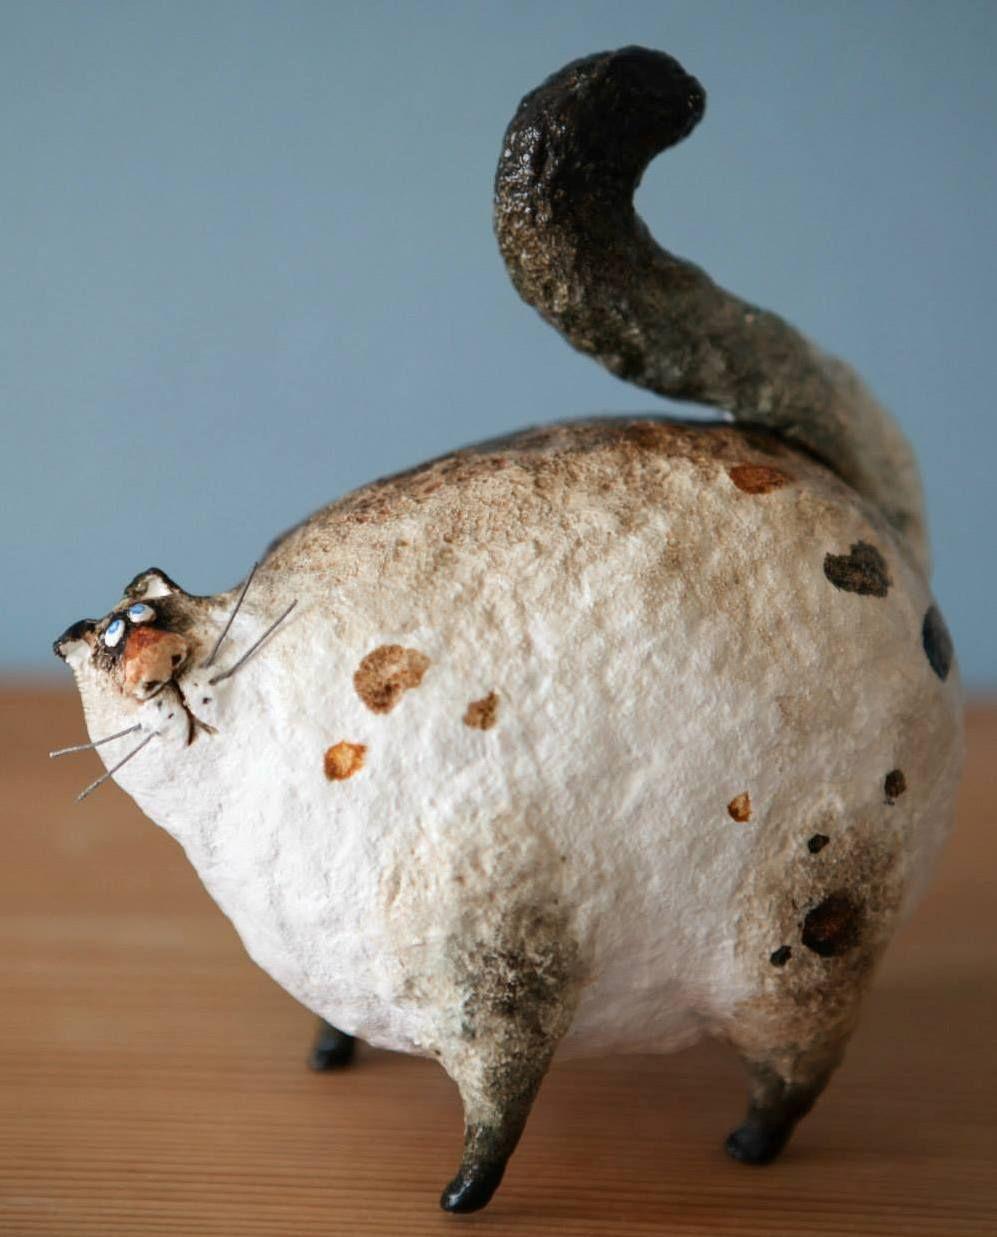 So cute ! KATYA Fairy tales 11 cm, papier mache, modelling clay https://www.facebook.com/129125573789241/photos/a.132708956764236.10621.129125573789241/132713196763812/?type=3&theater